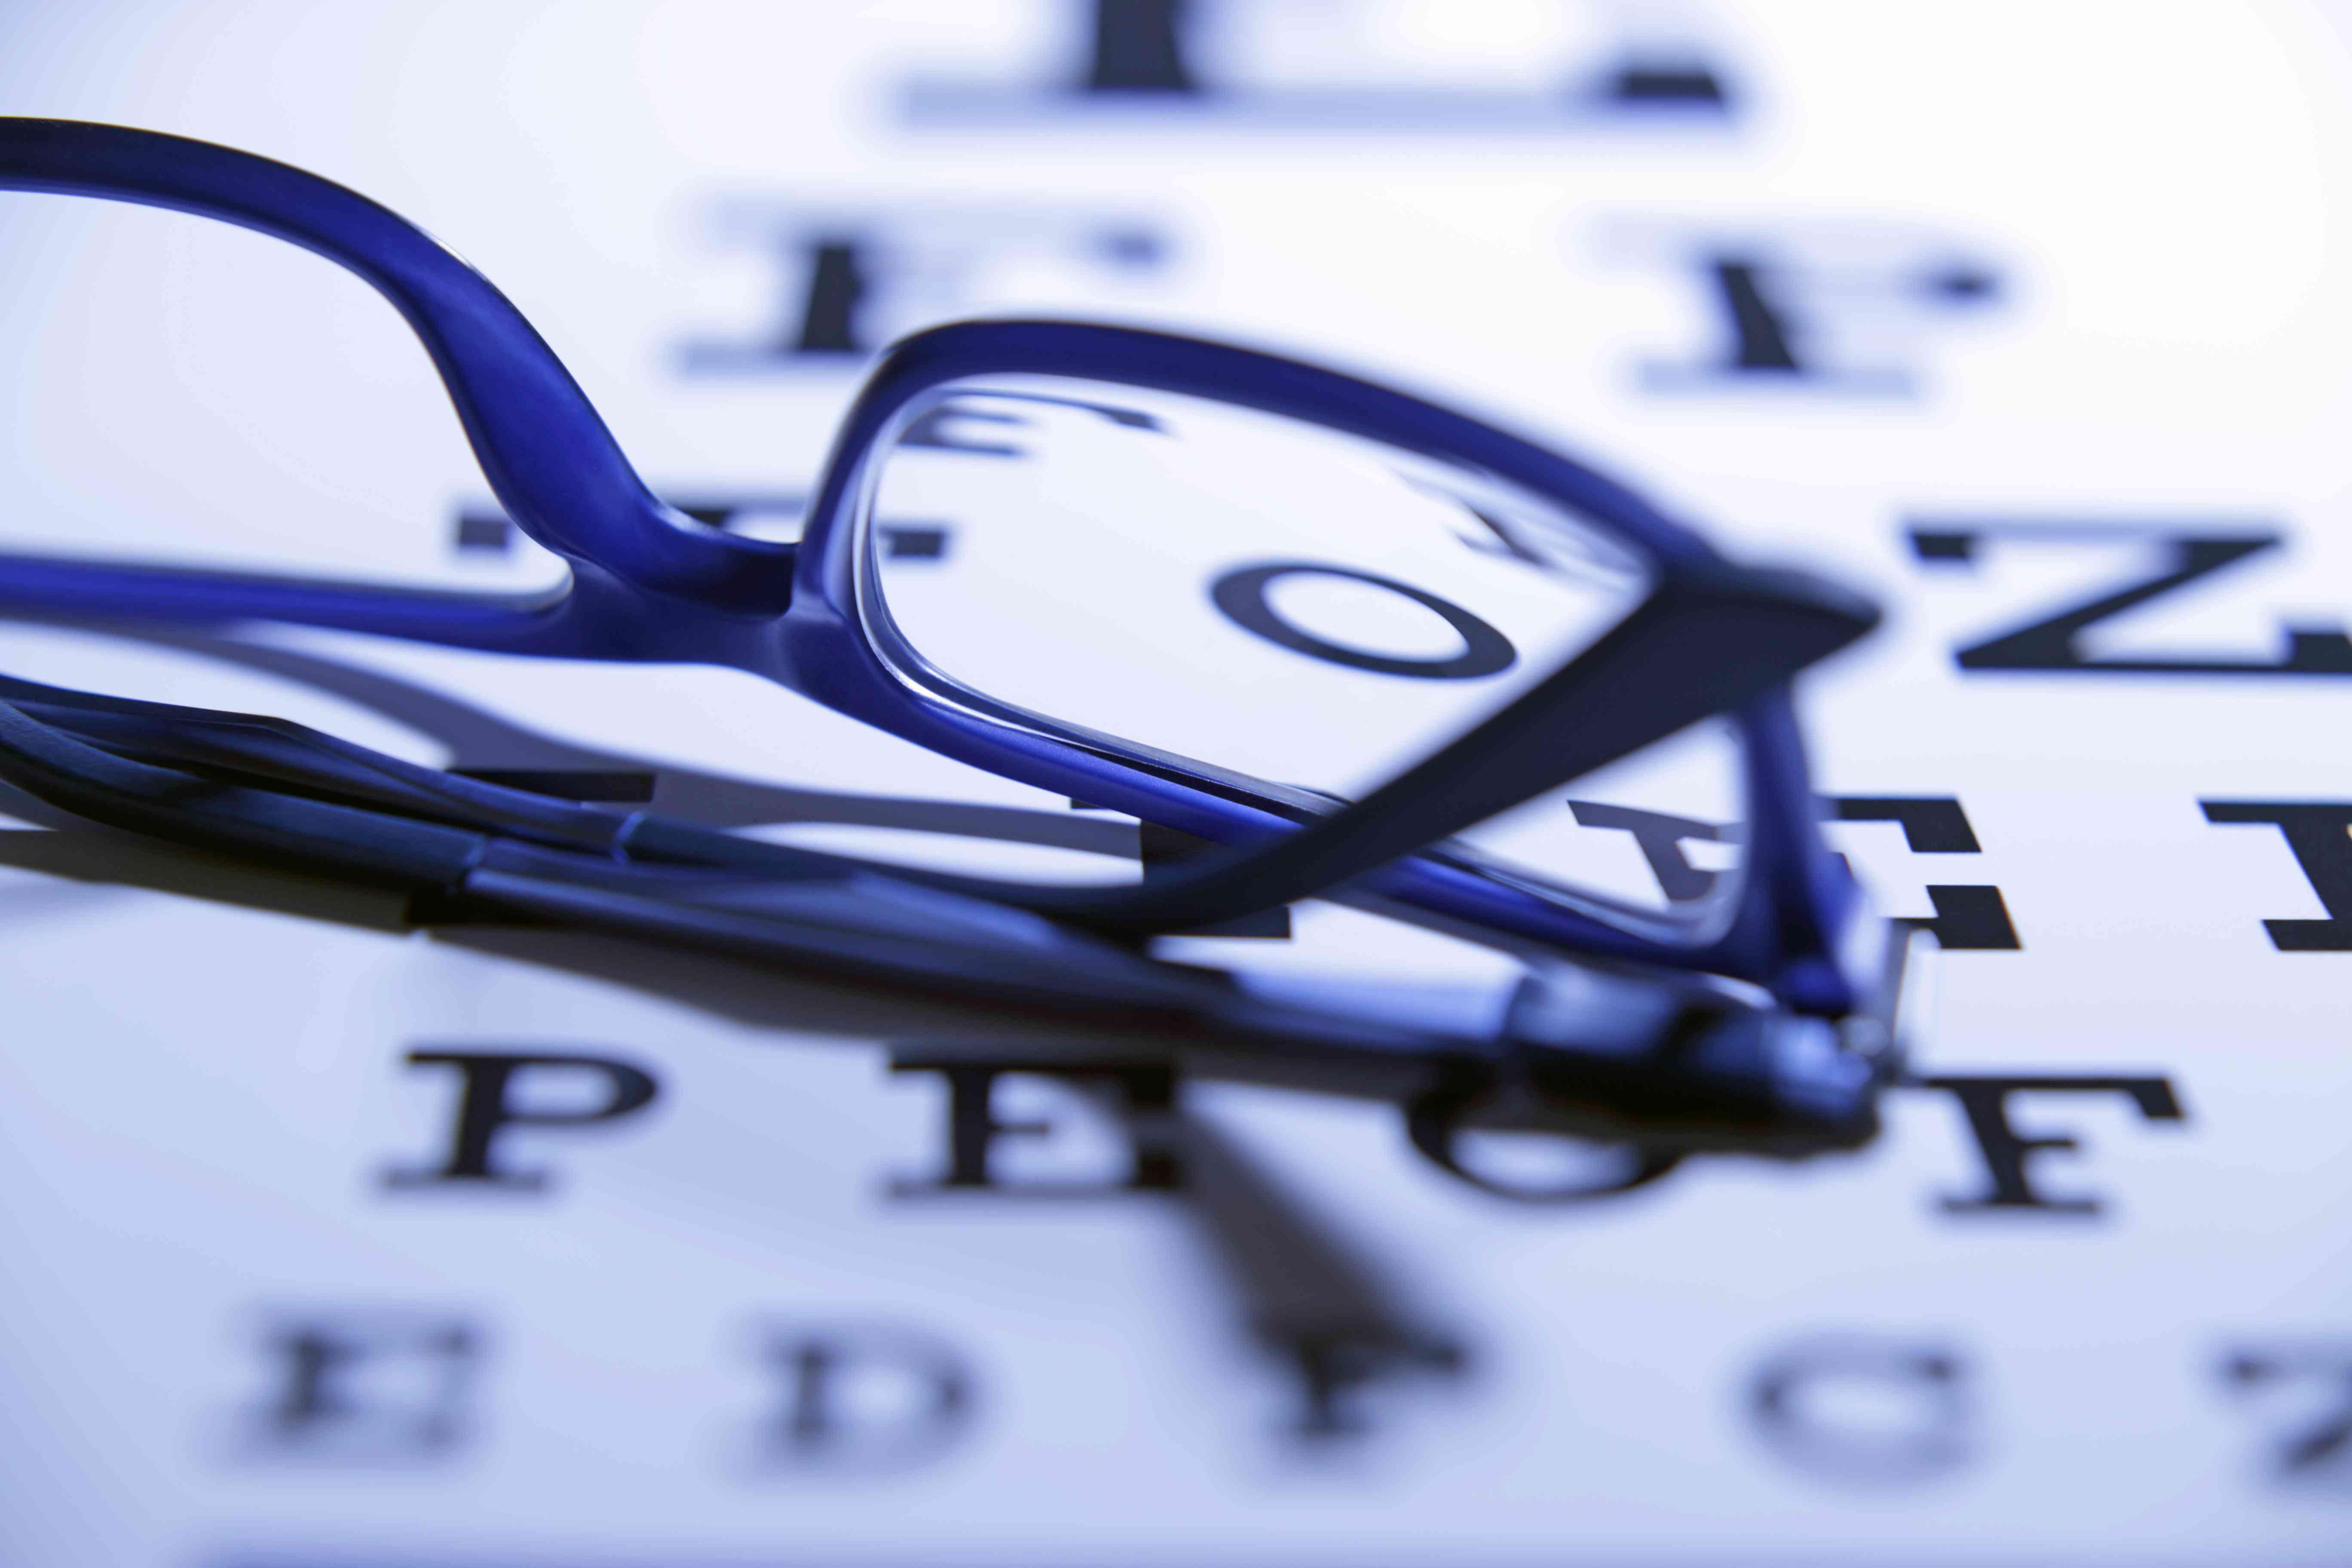 Eye glasses sitting on an eye exam chart